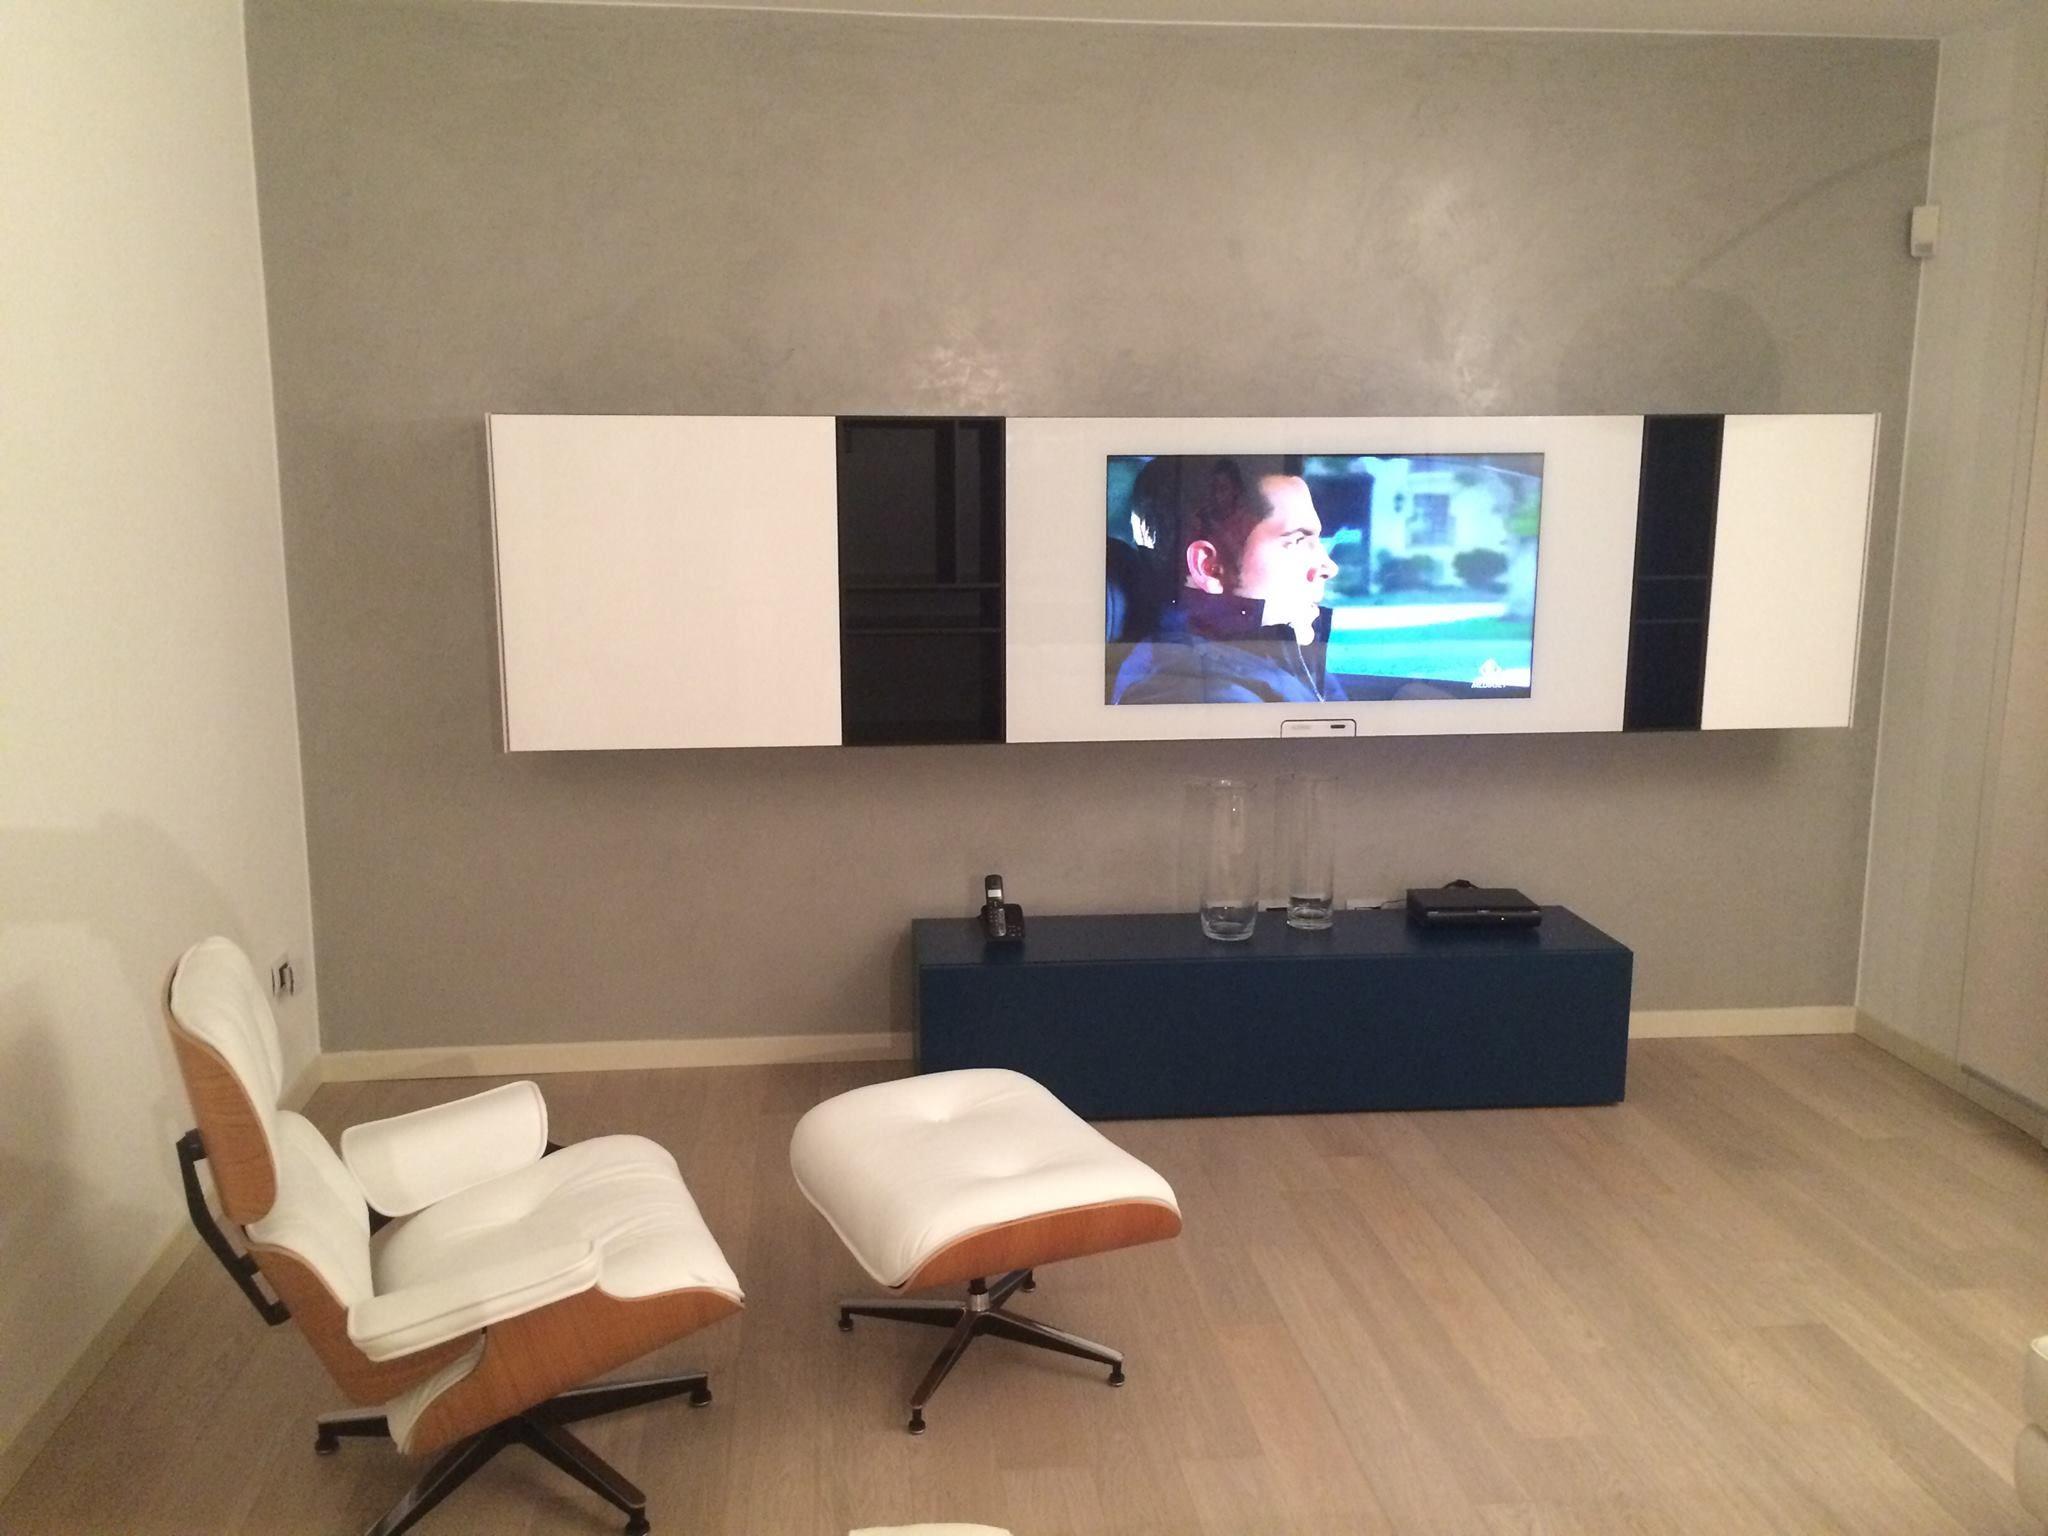 Alivar Sedie ~ Smartwall design massimo castagna by acerbis lounge chair e pouff